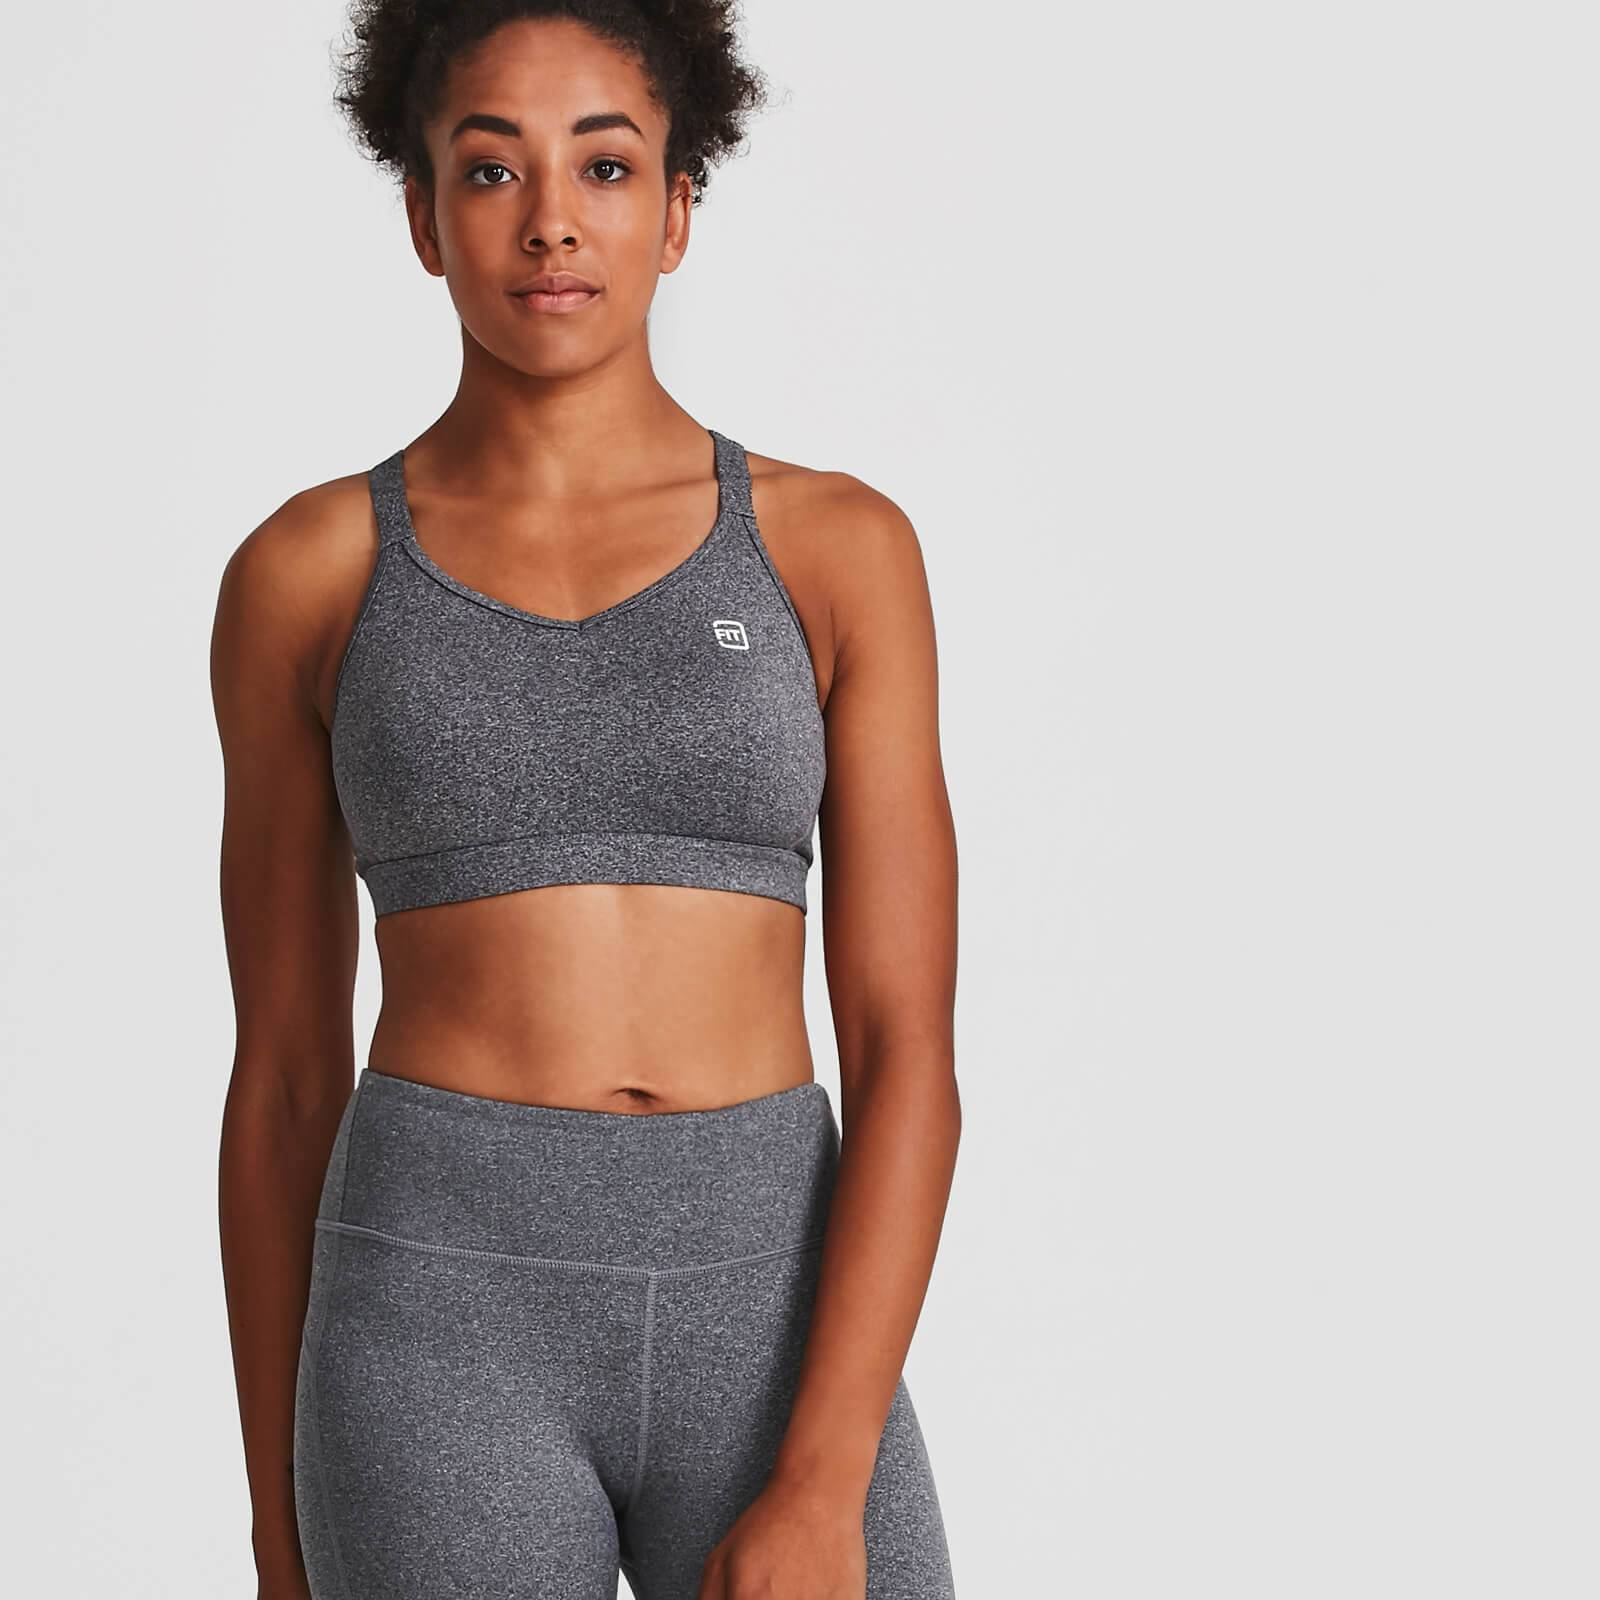 IdealFit Core Sports Bra - Grey - XL - Grey